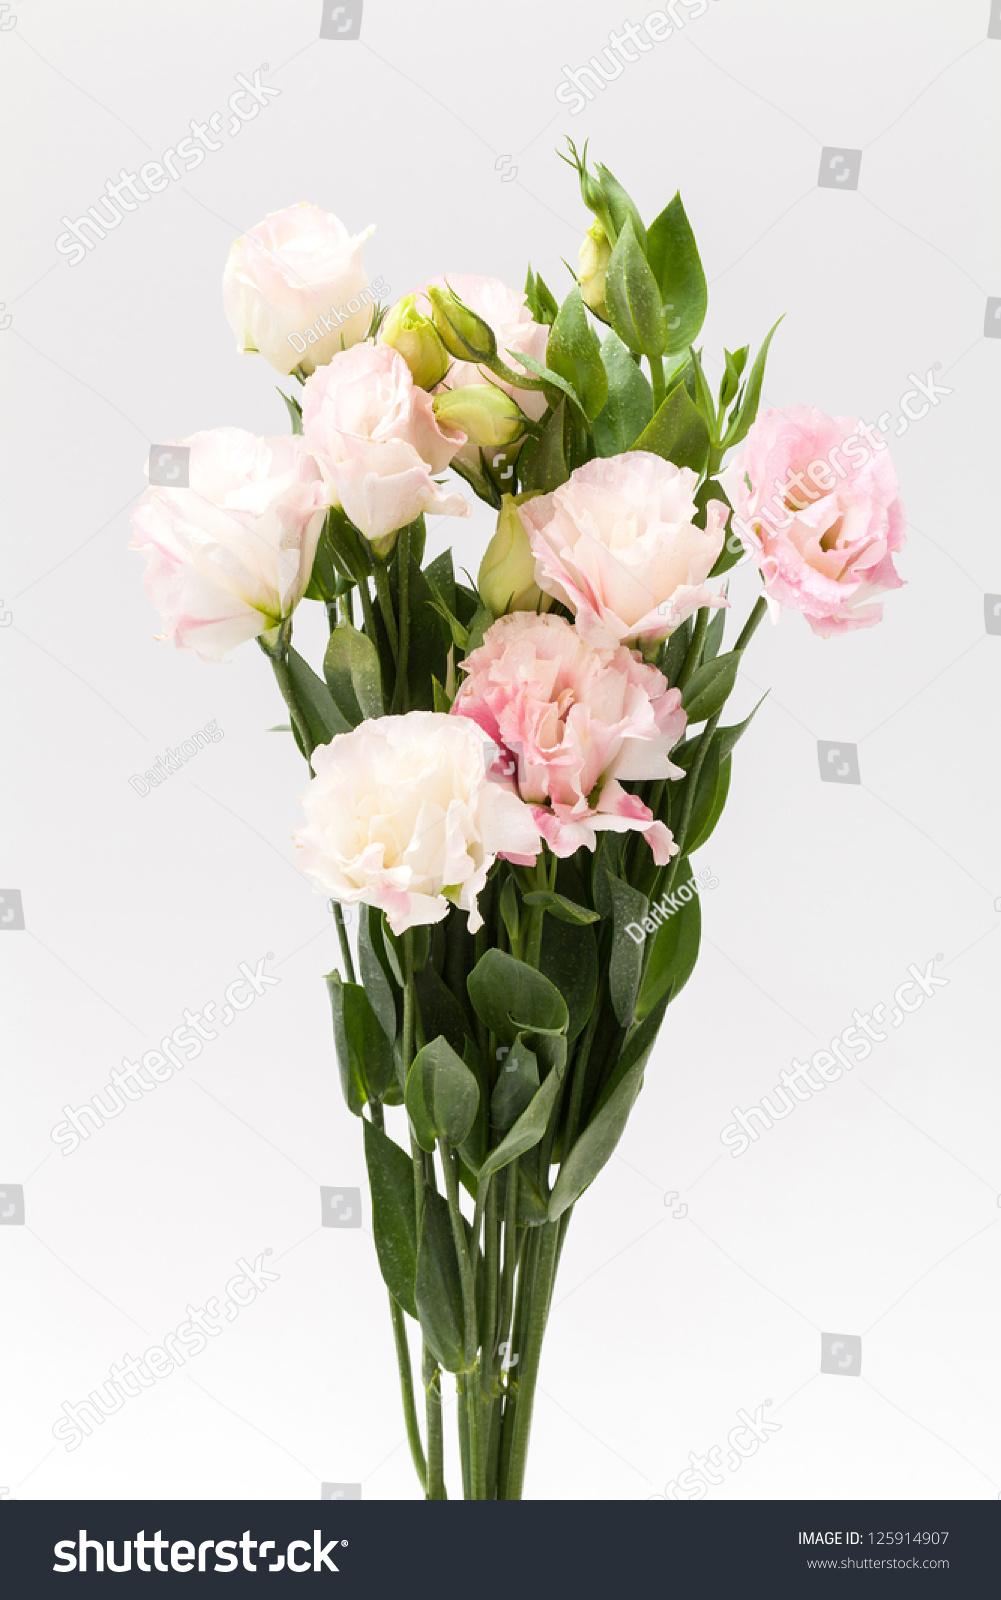 Lisianthus Flower On White Background Stock Photo Edit Now